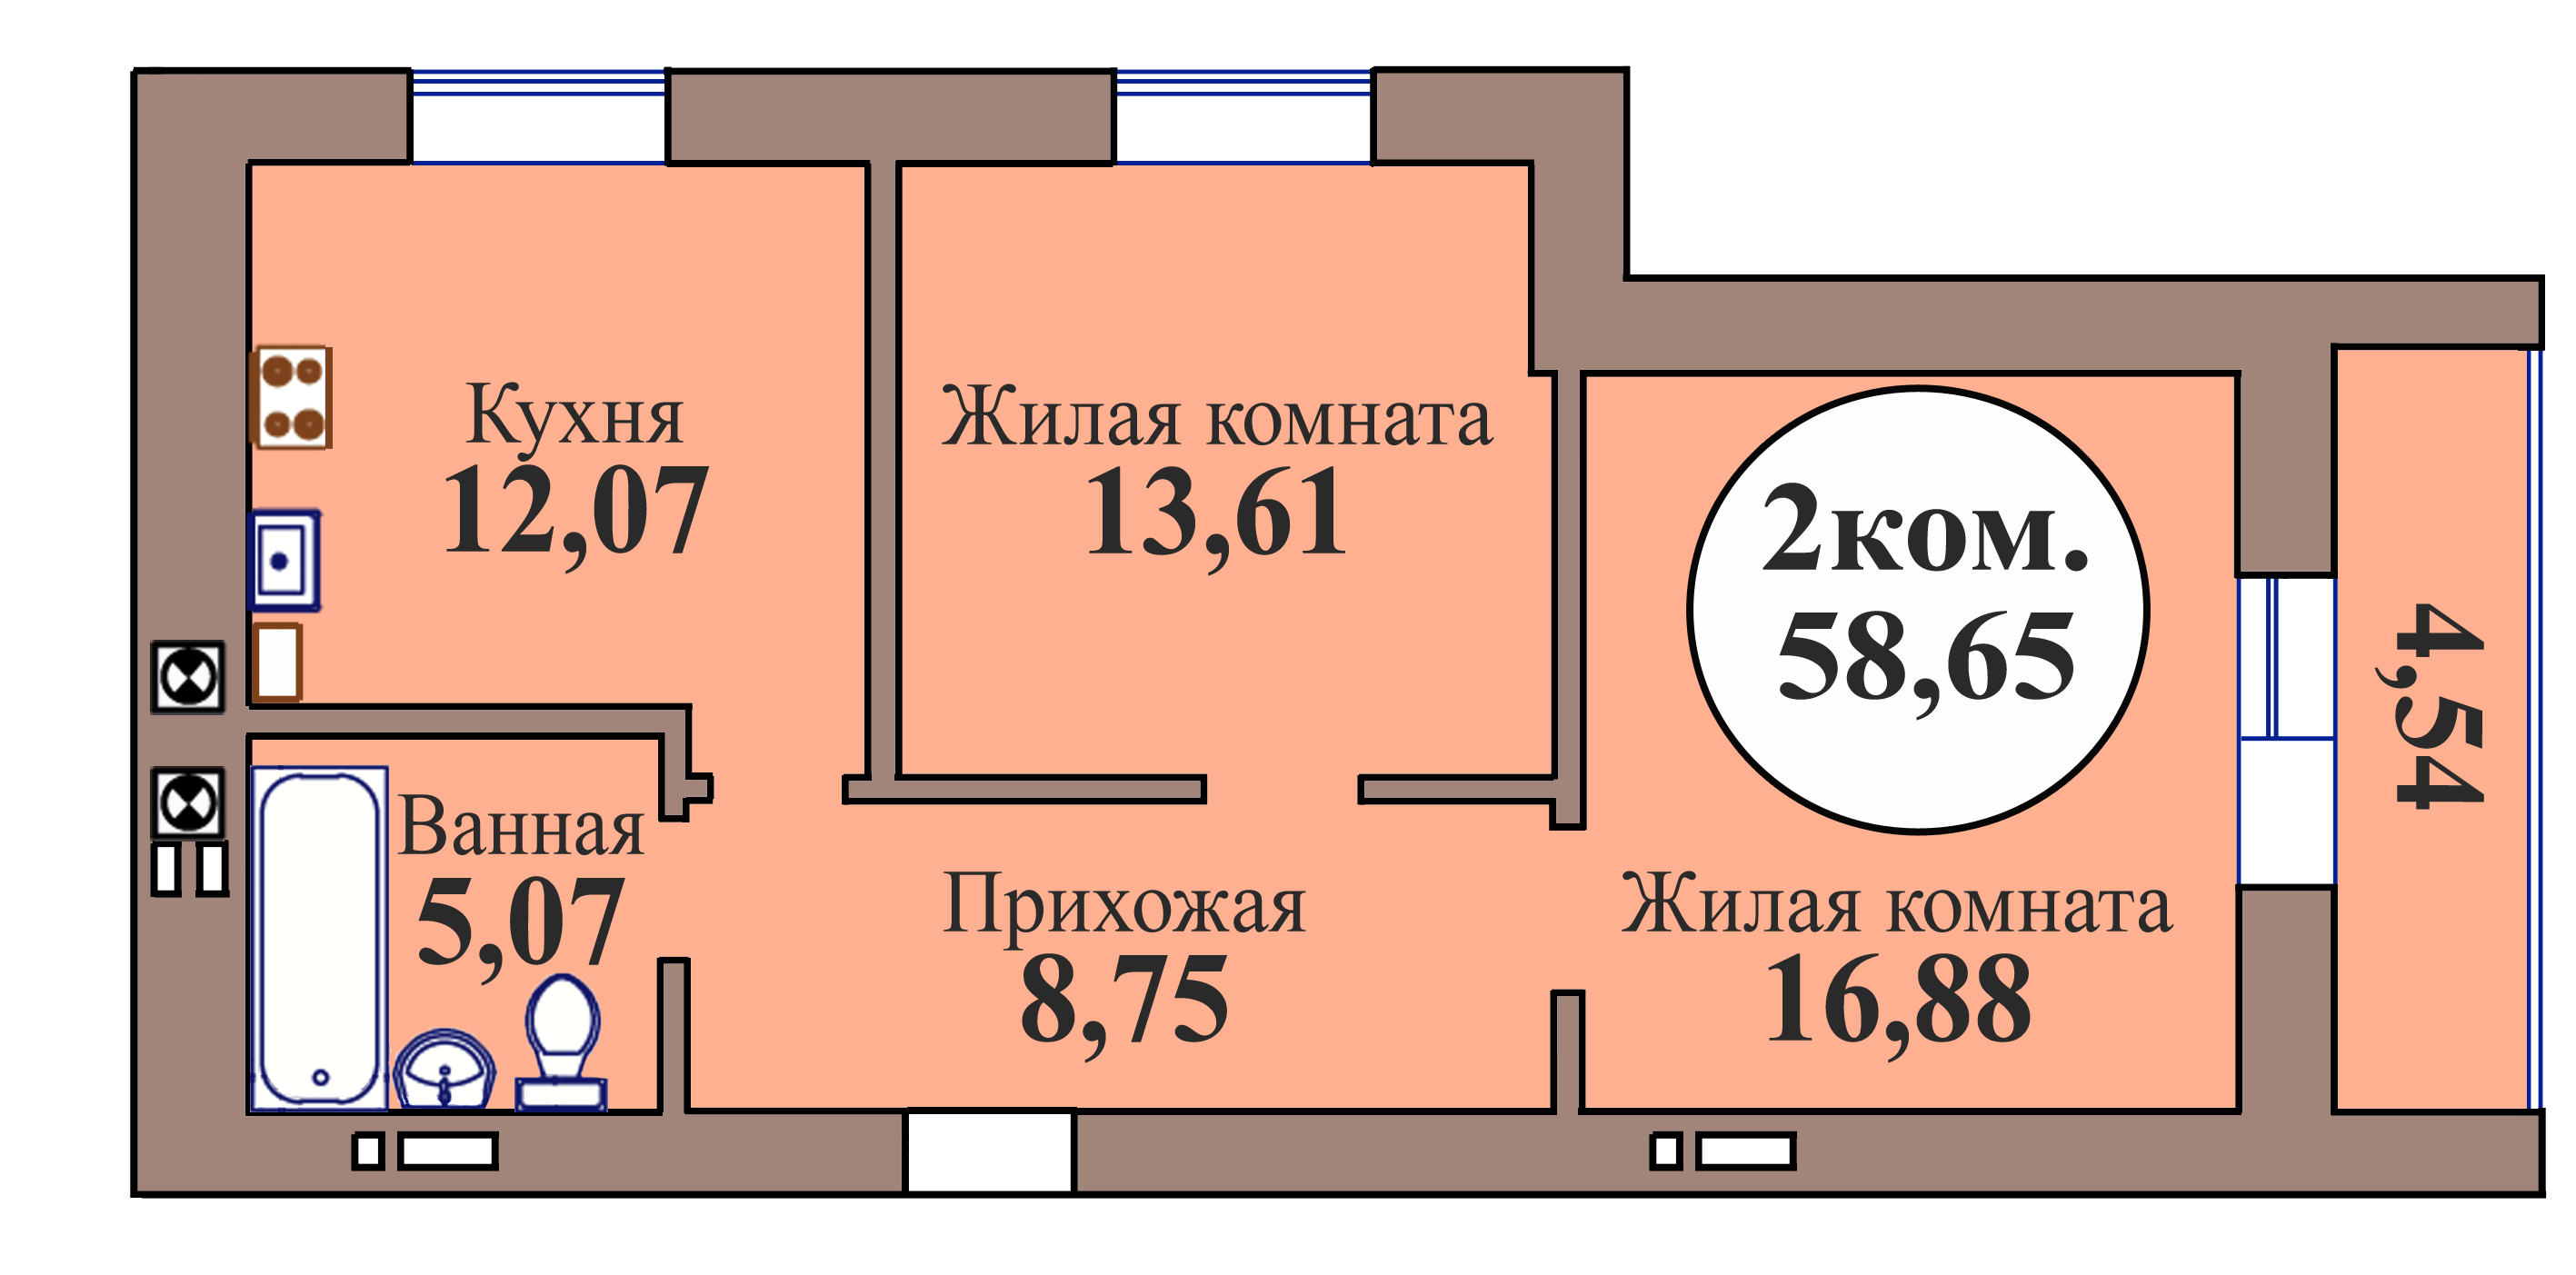 2-комн. кв. по пер. Калининградский, 5 кв. 152 в Калининграде